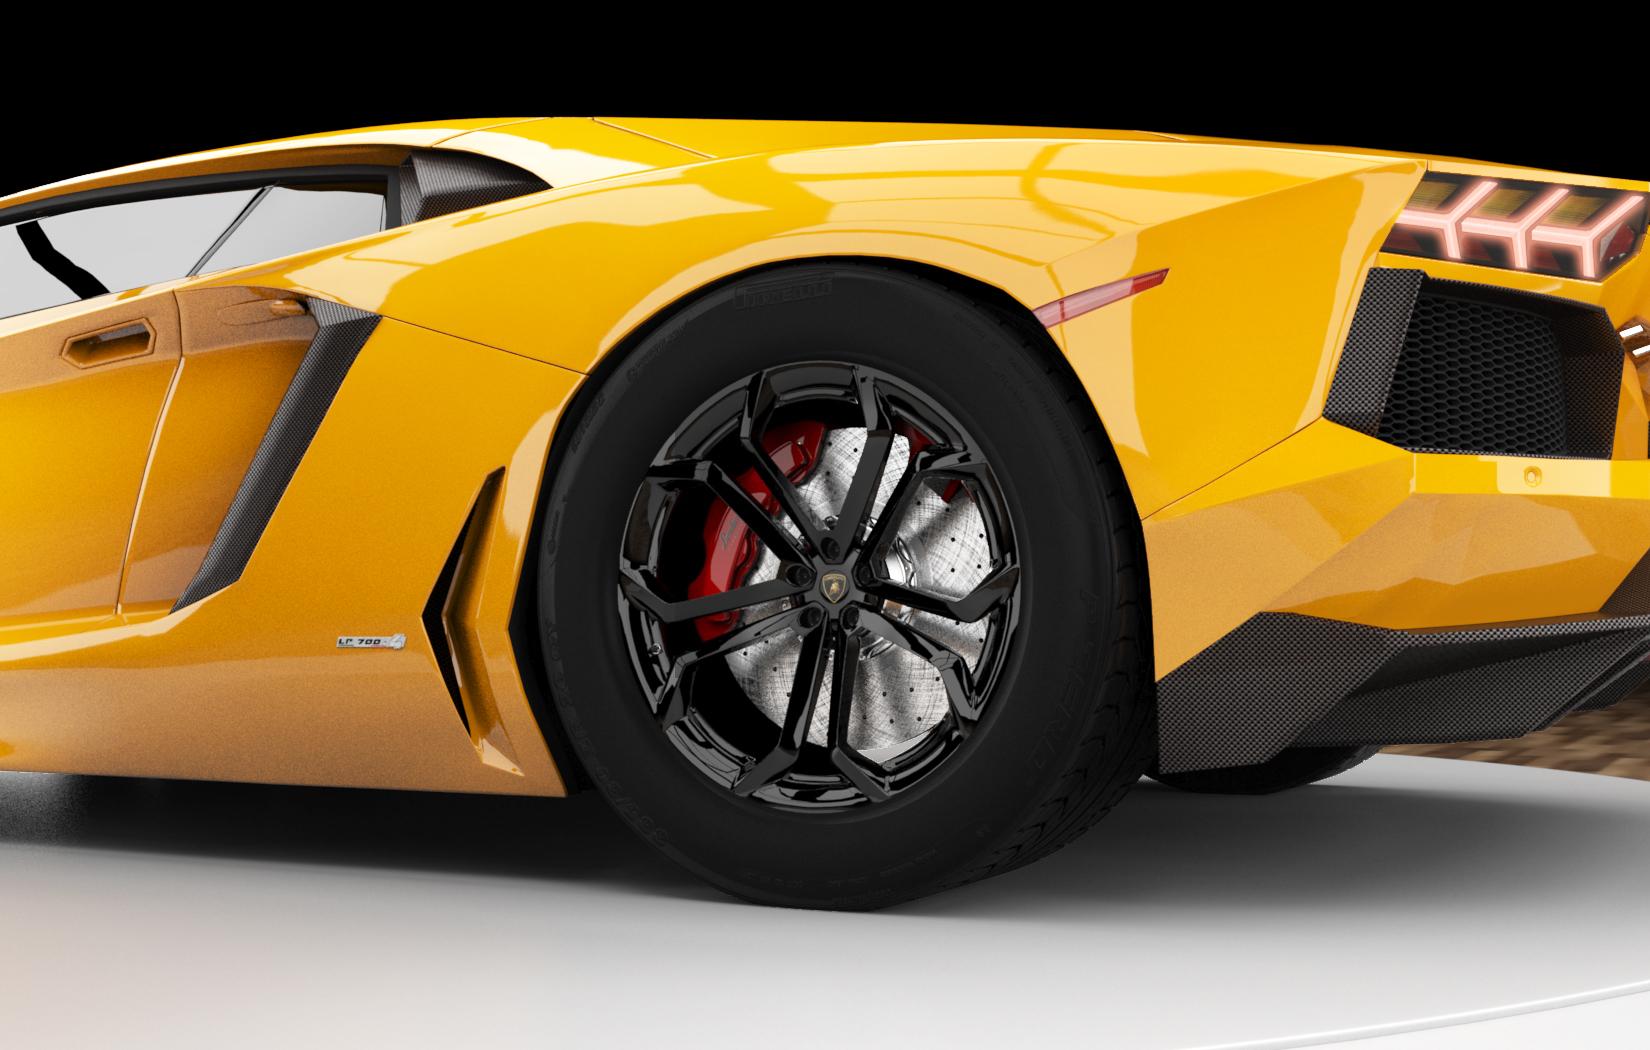 Rear Wheel View